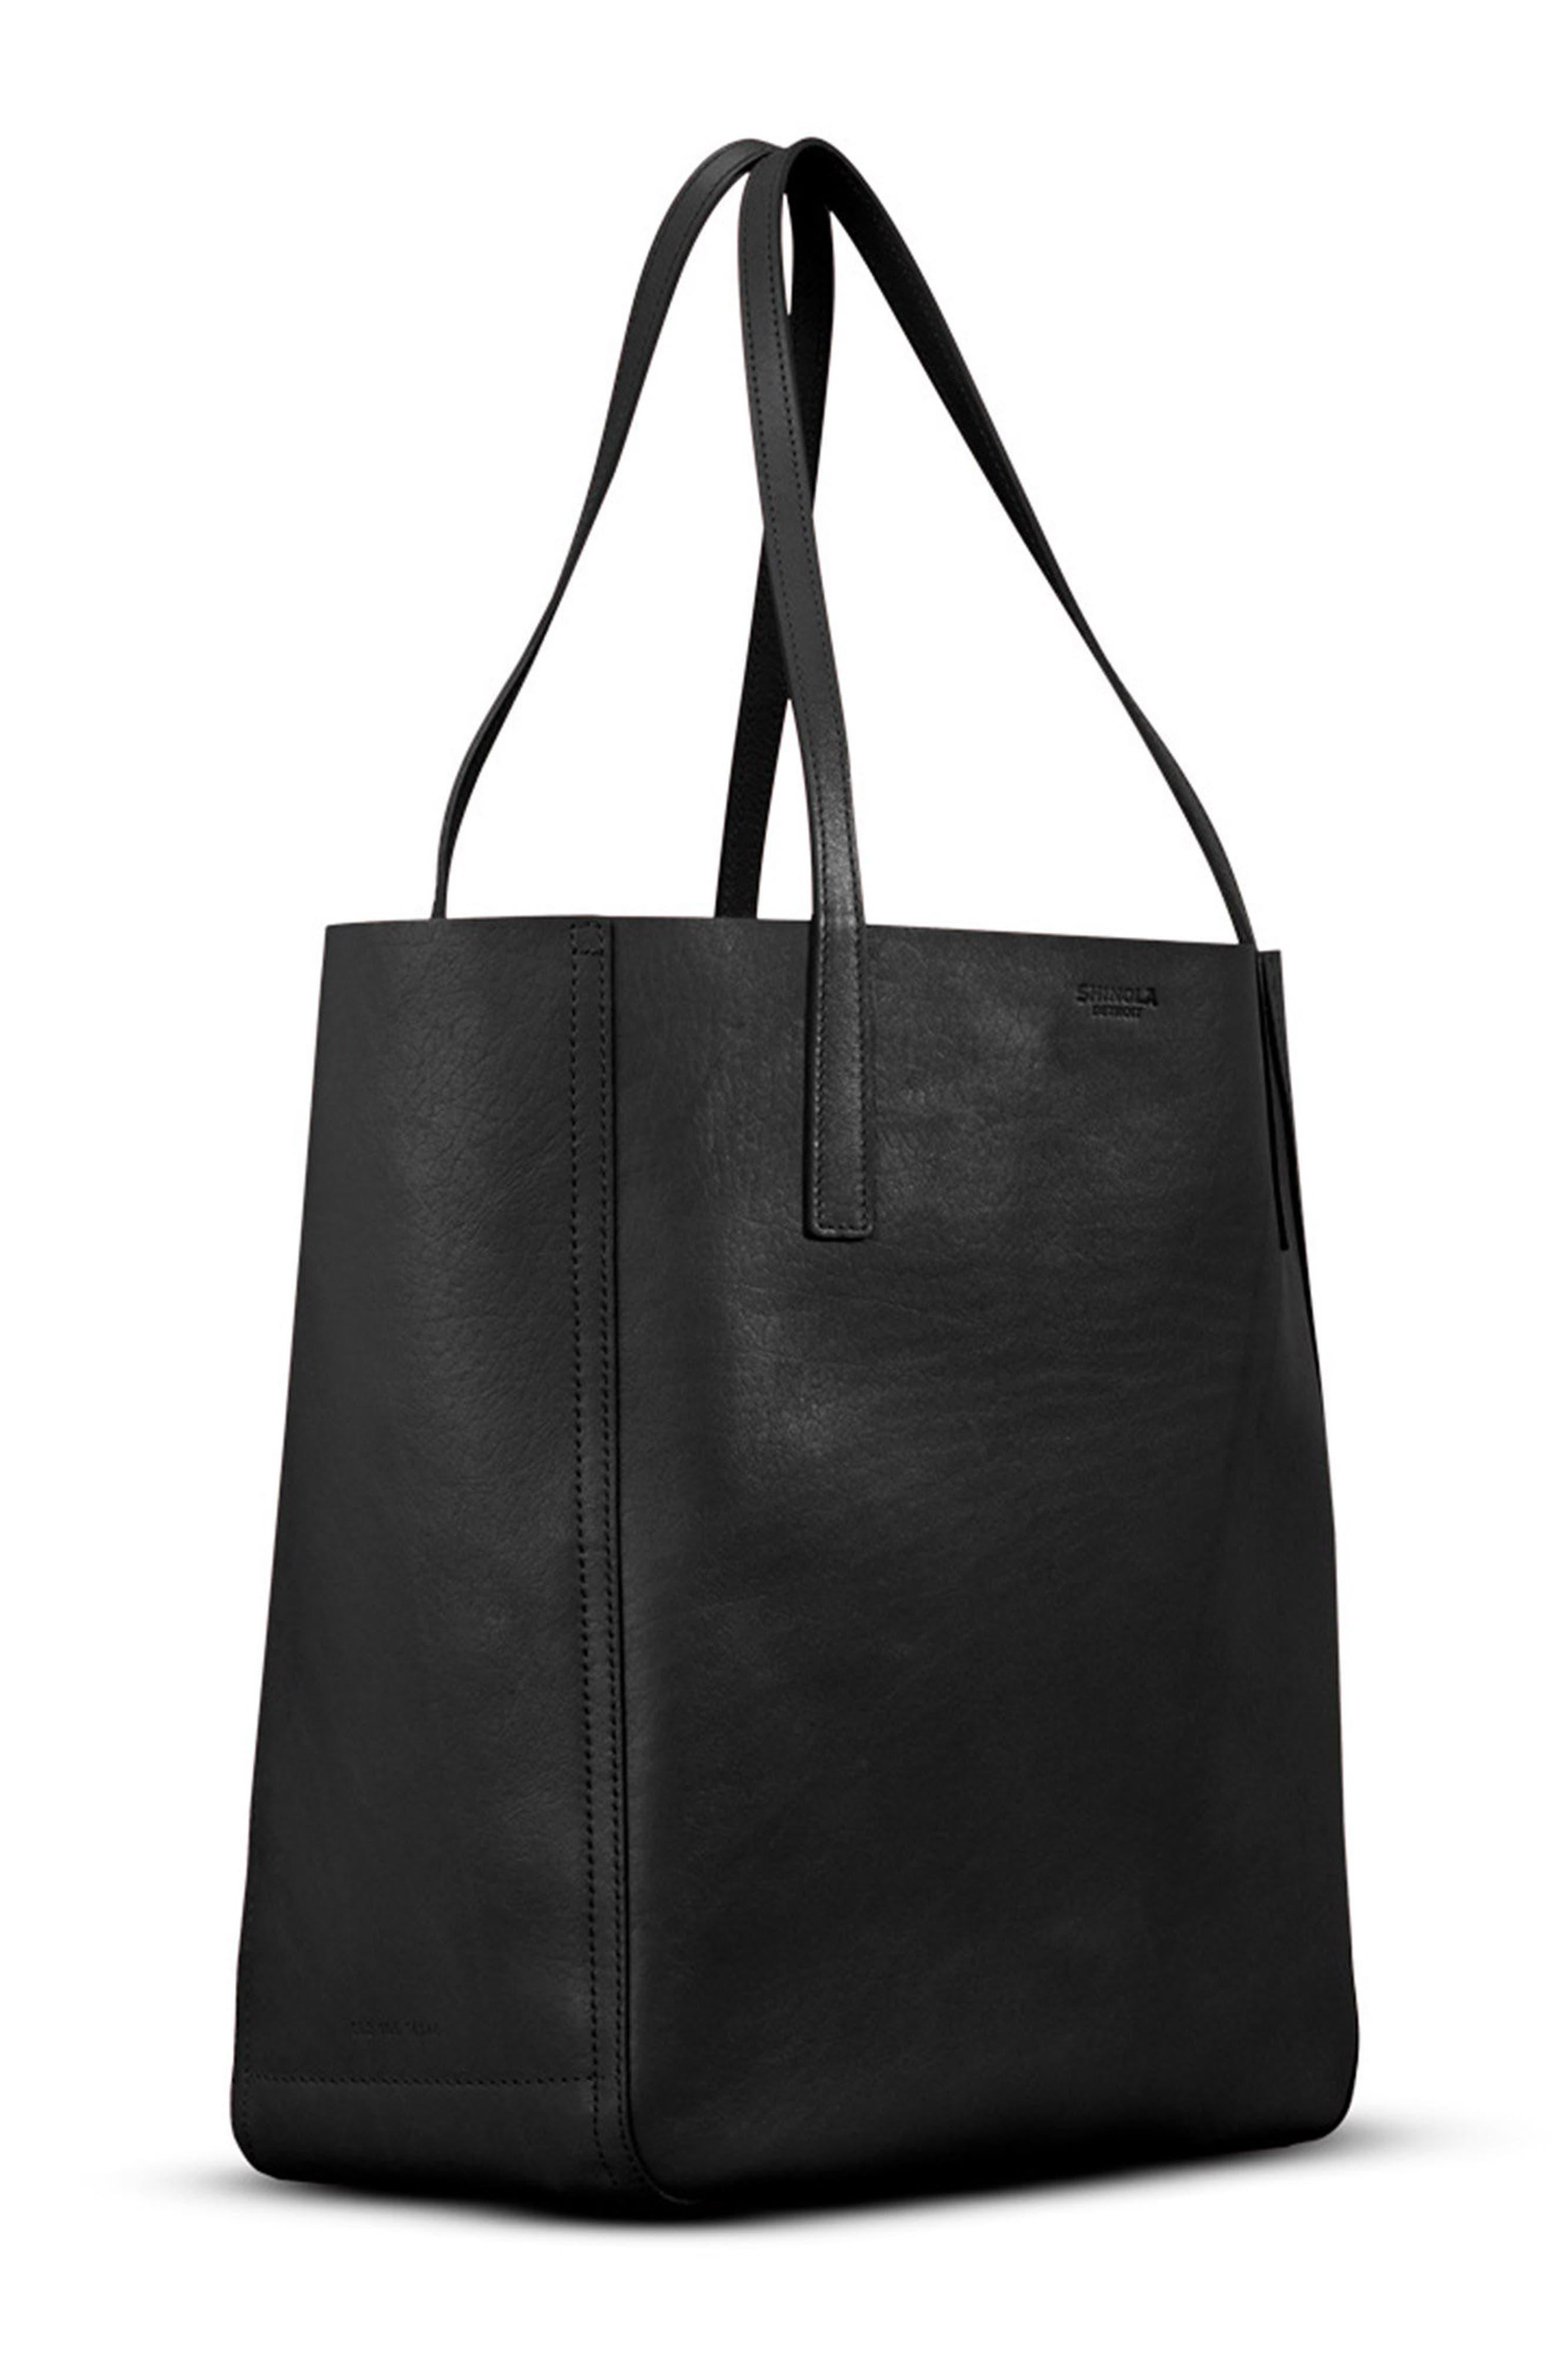 Medium Leather Shopper,                             Alternate thumbnail 4, color,                             Black